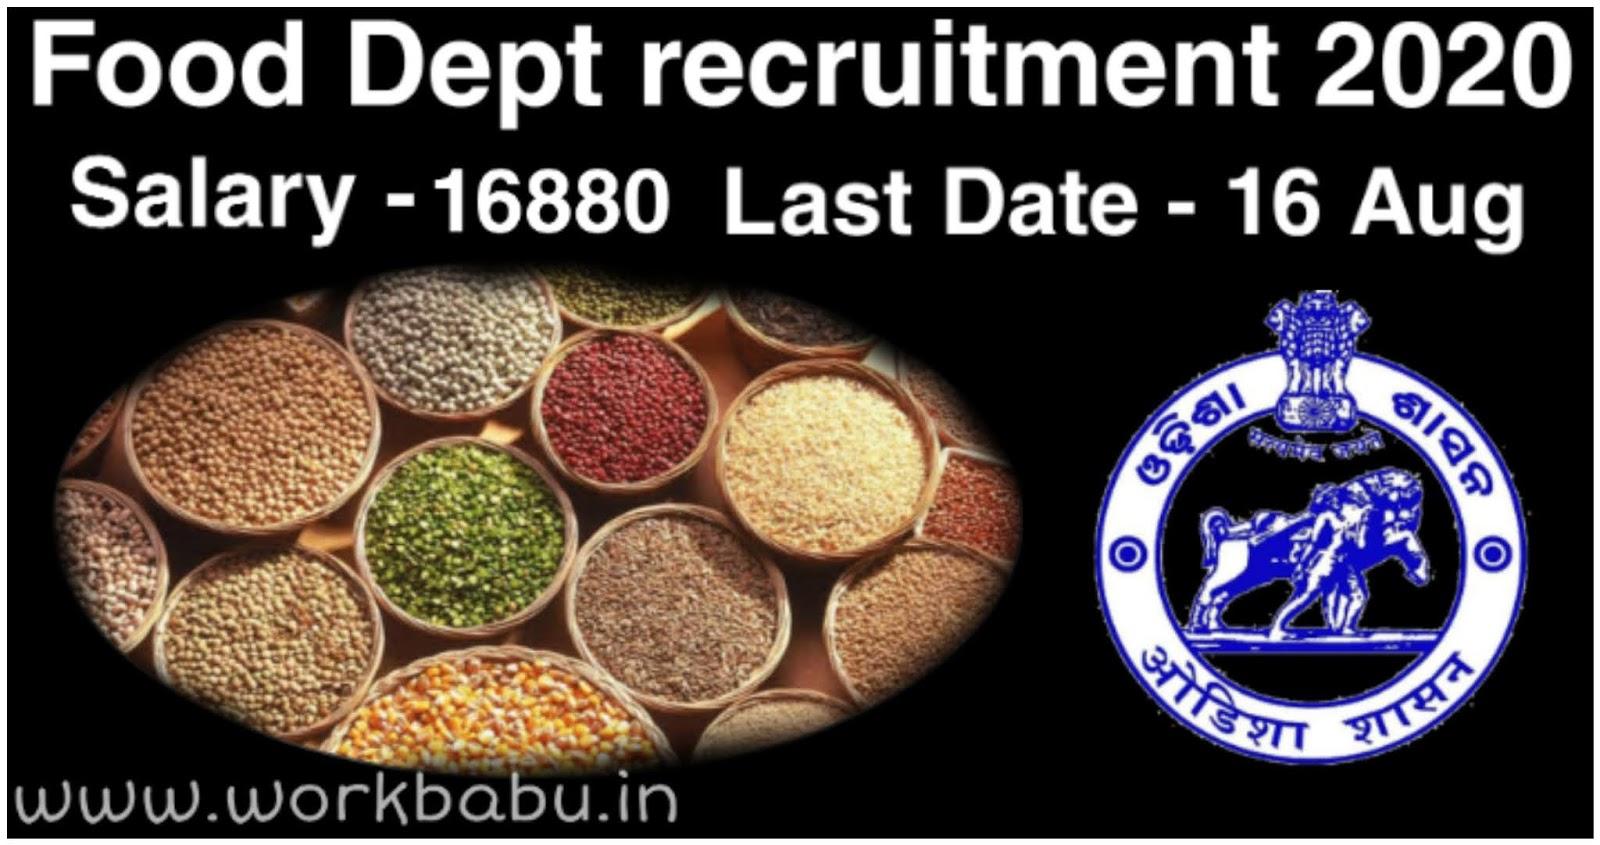 Food Dept recruitment 2020